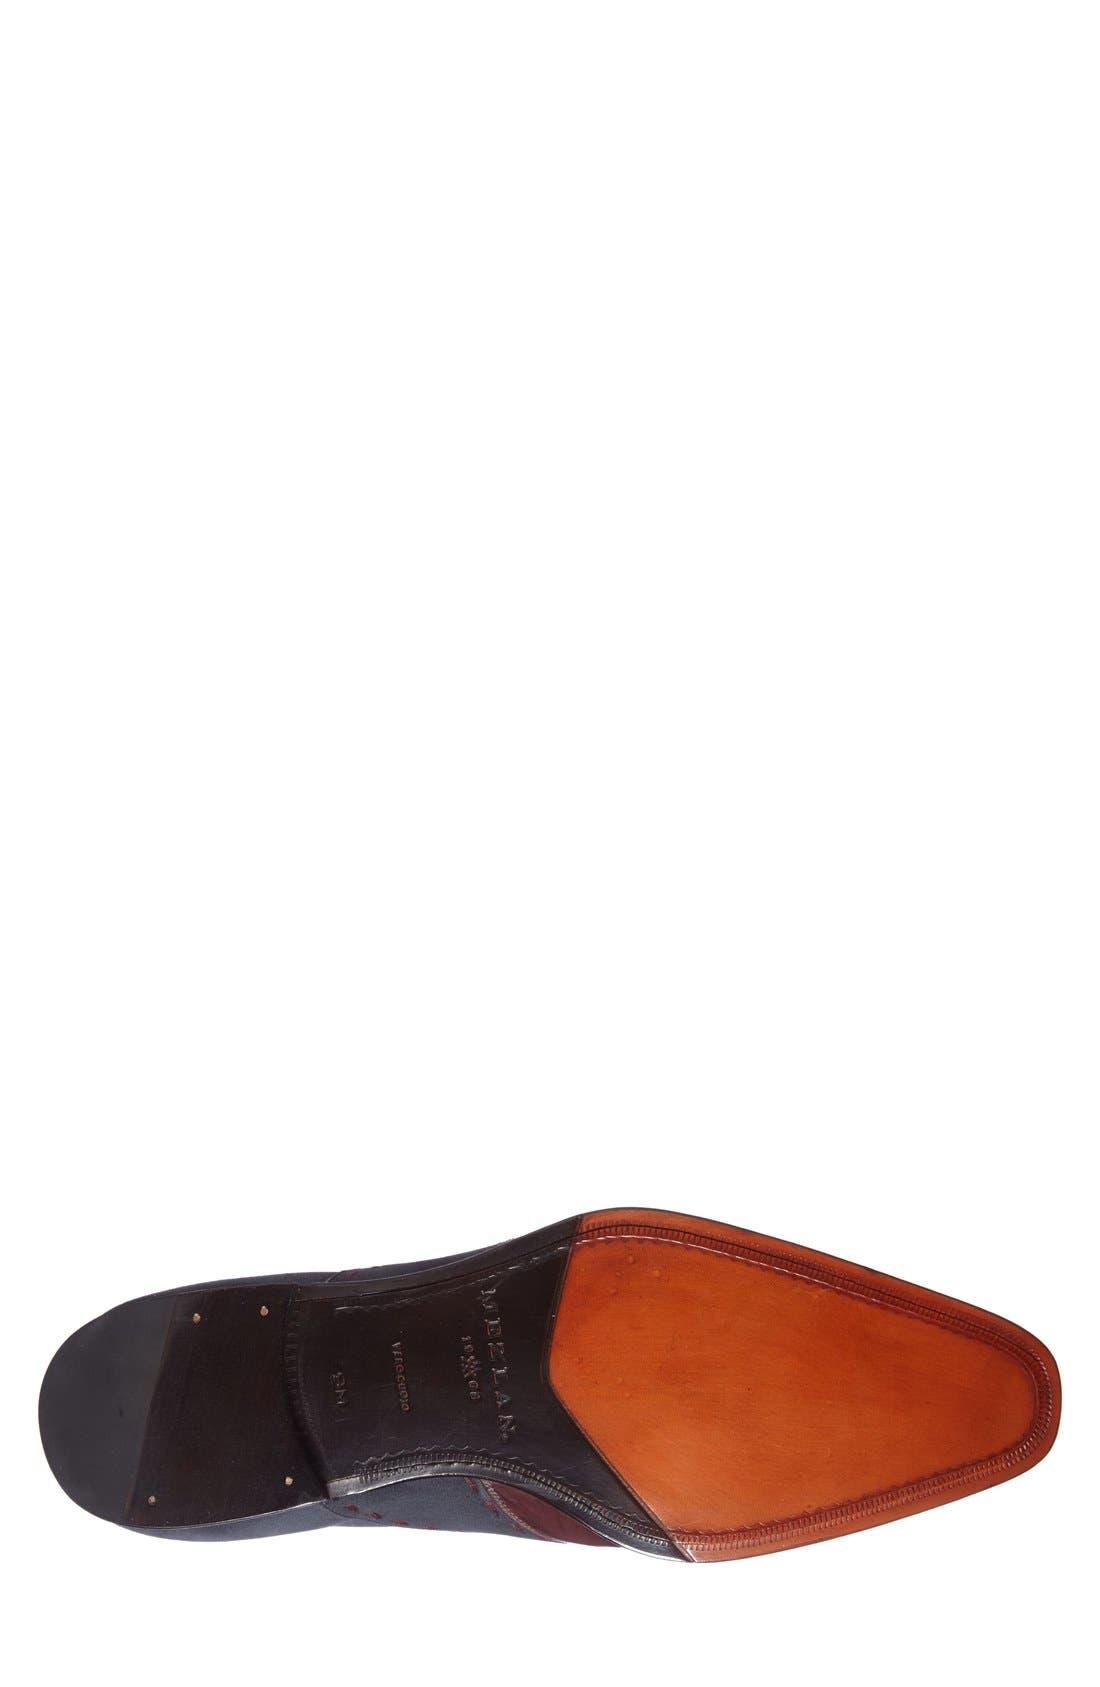 'Ronda' Spectator Shoe,                             Alternate thumbnail 4, color,                             BURGUNDY/ GREY